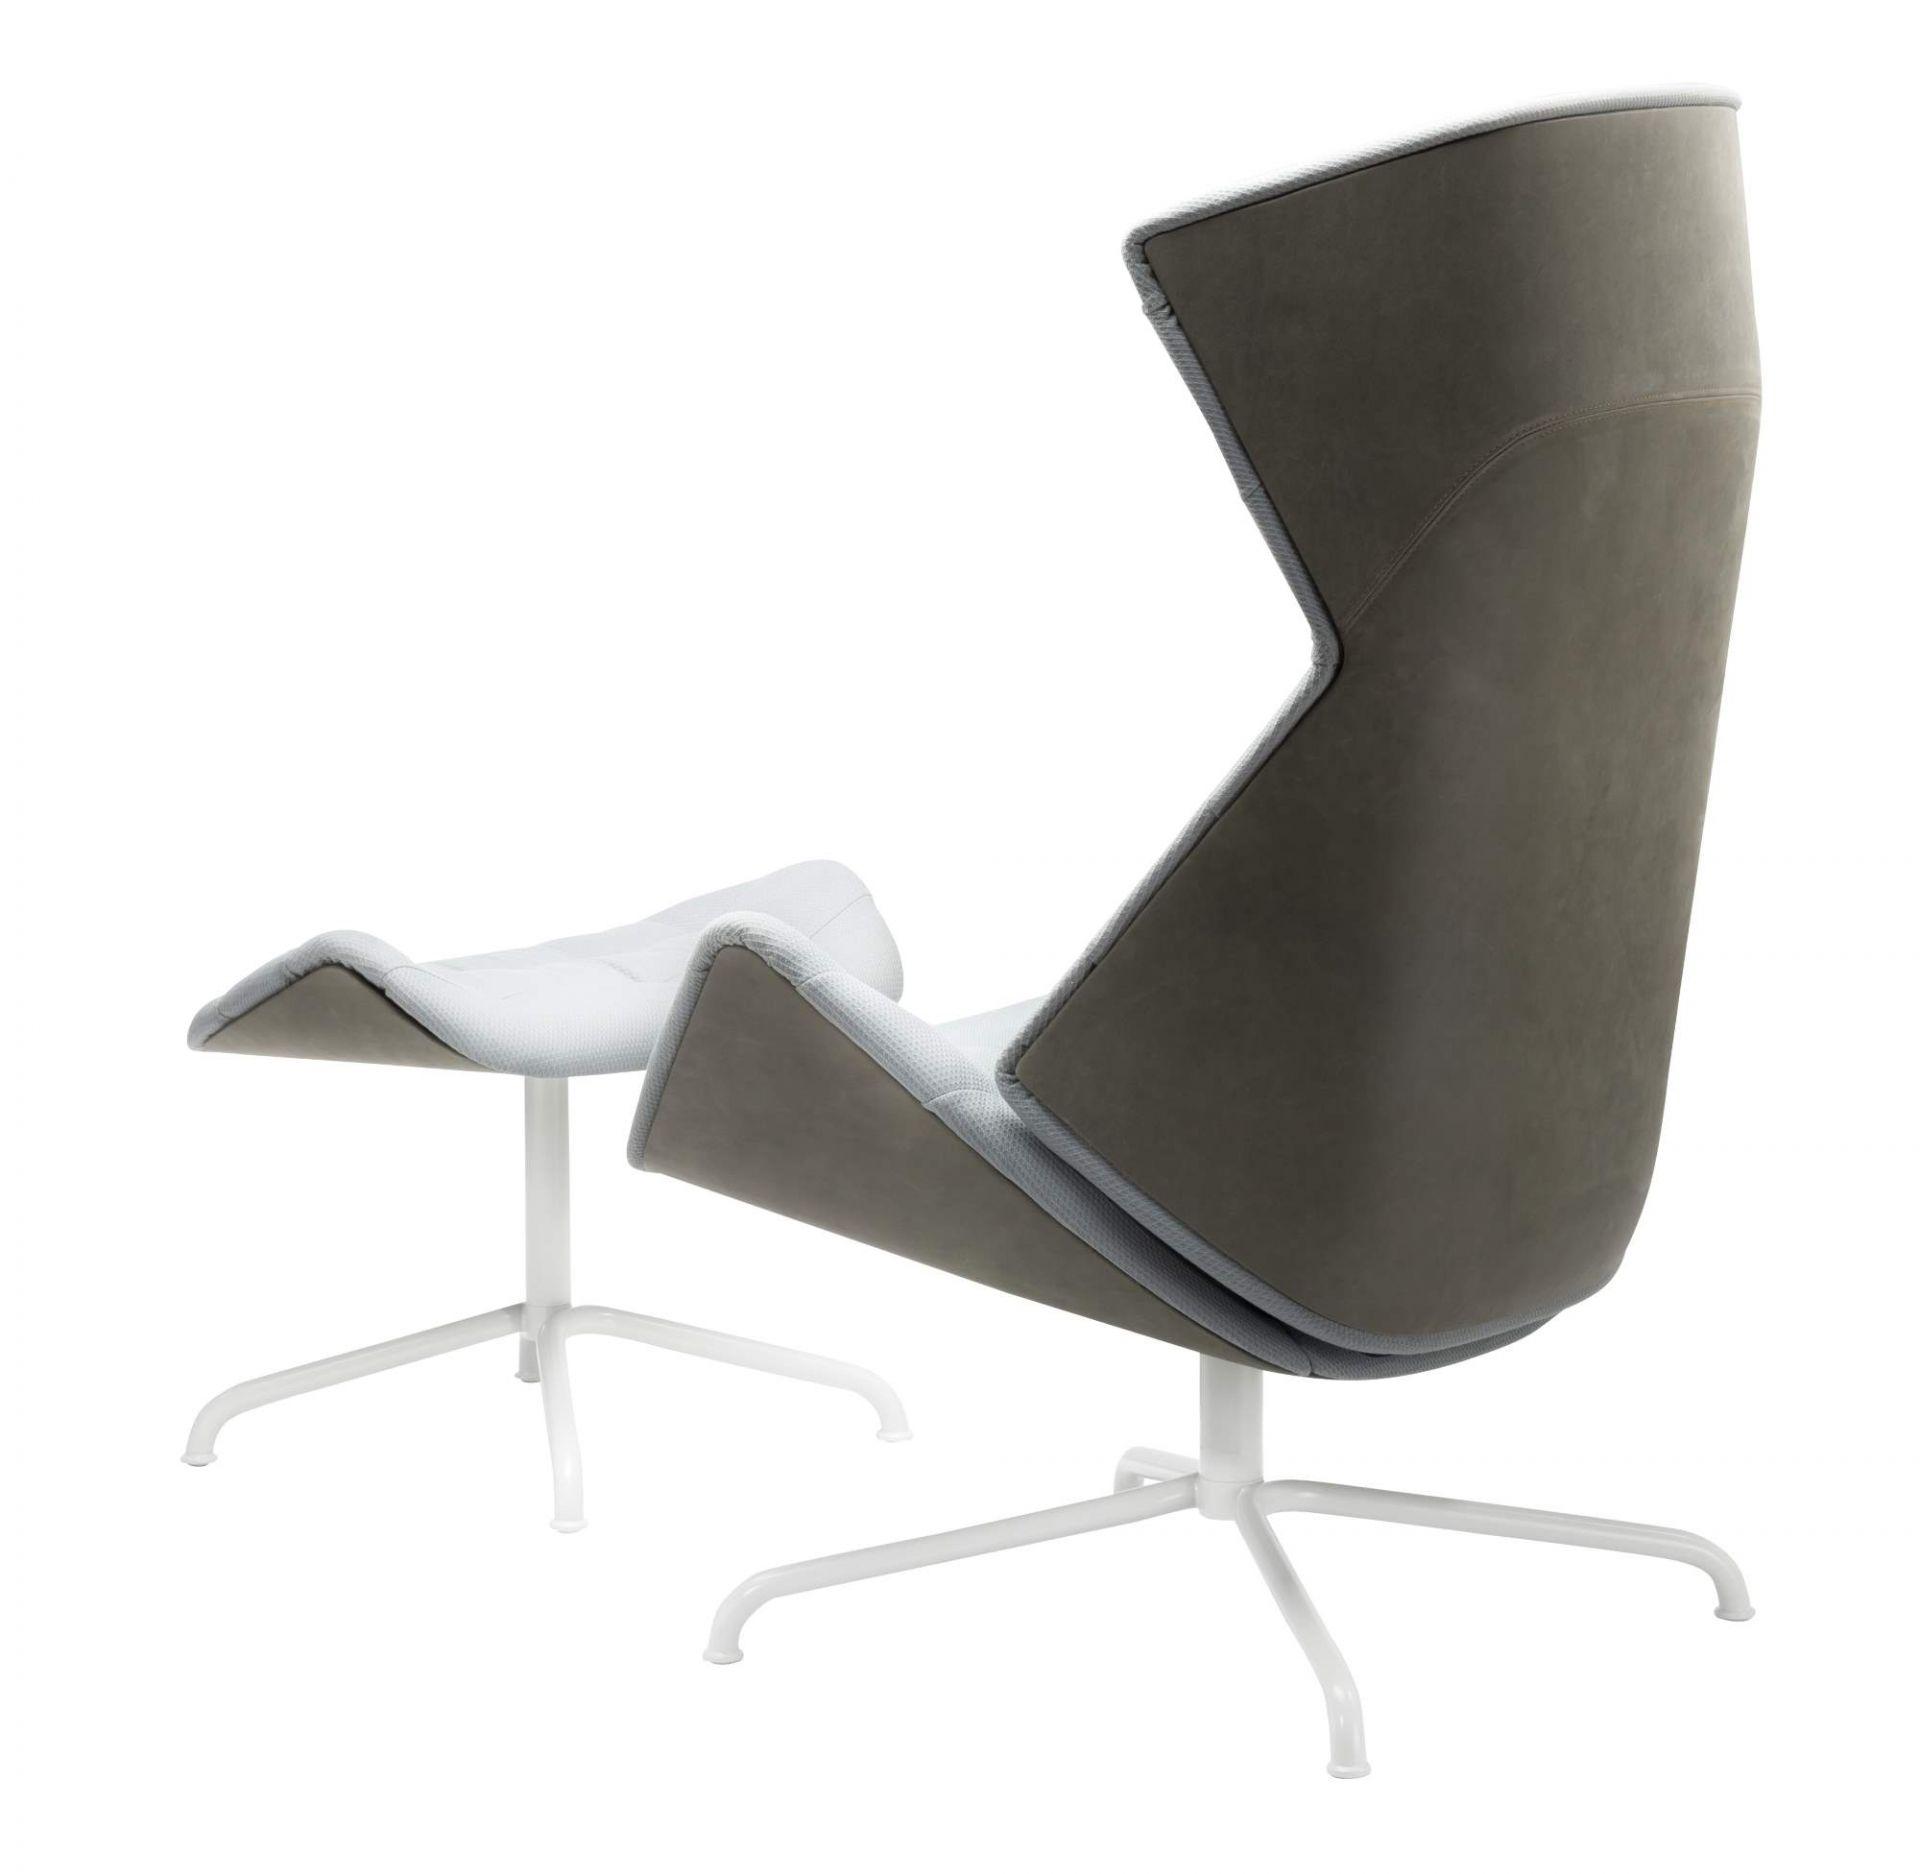 808 Lounge-Sessel Thonet